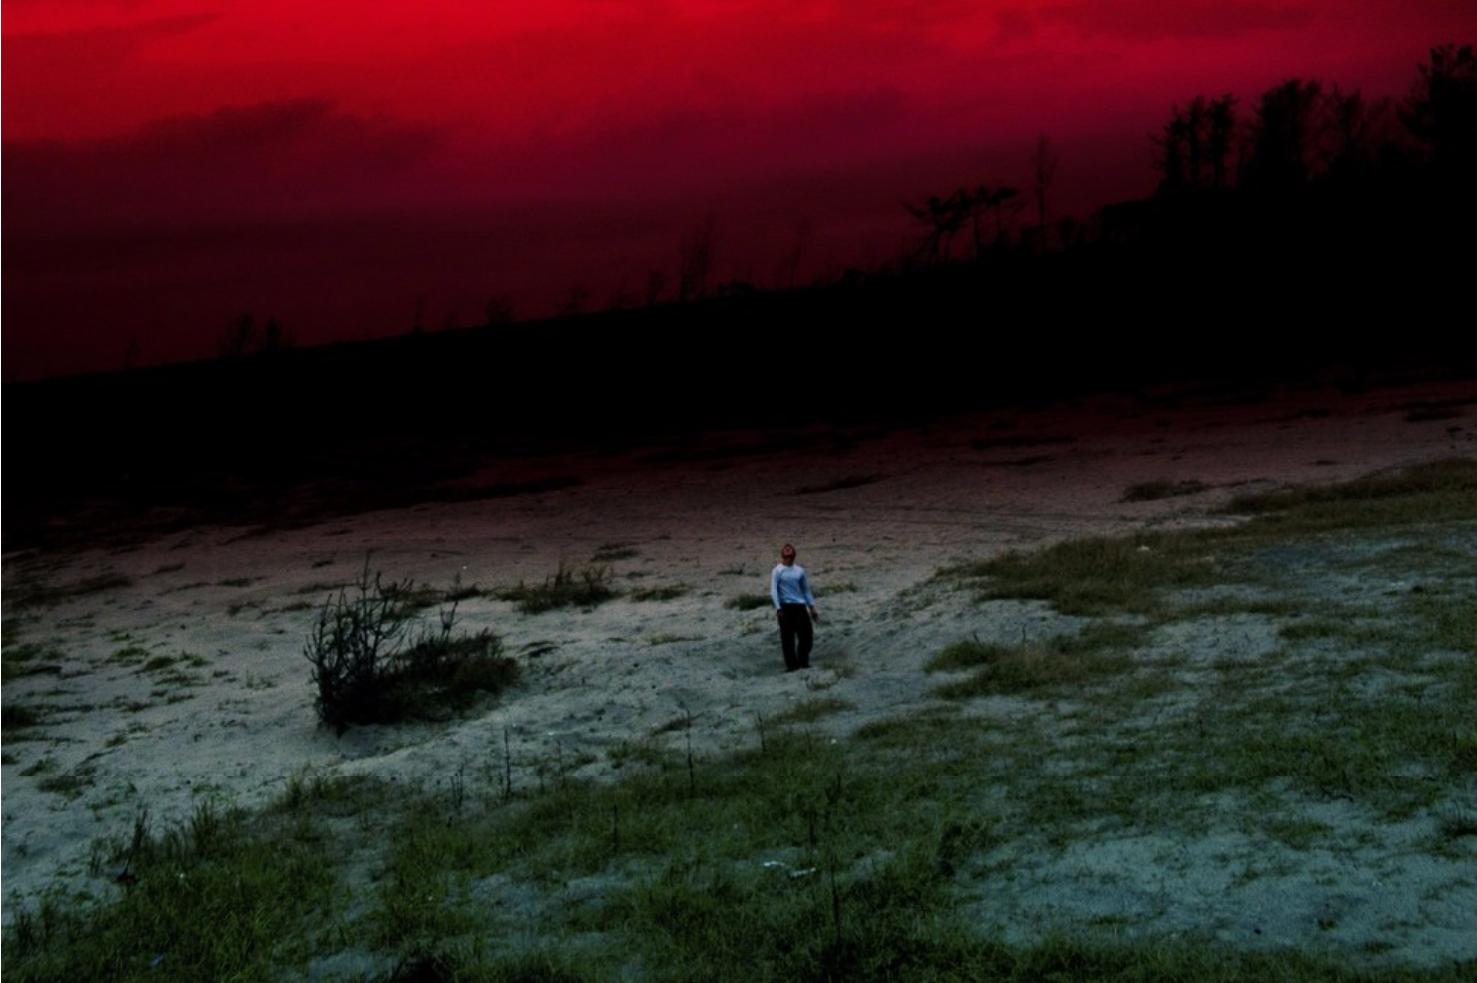 Lieko Shiga, Rasen kaigan (Spiral Shore) 45  from the series  Rasen kaigan (Spiral Shore) , 2012